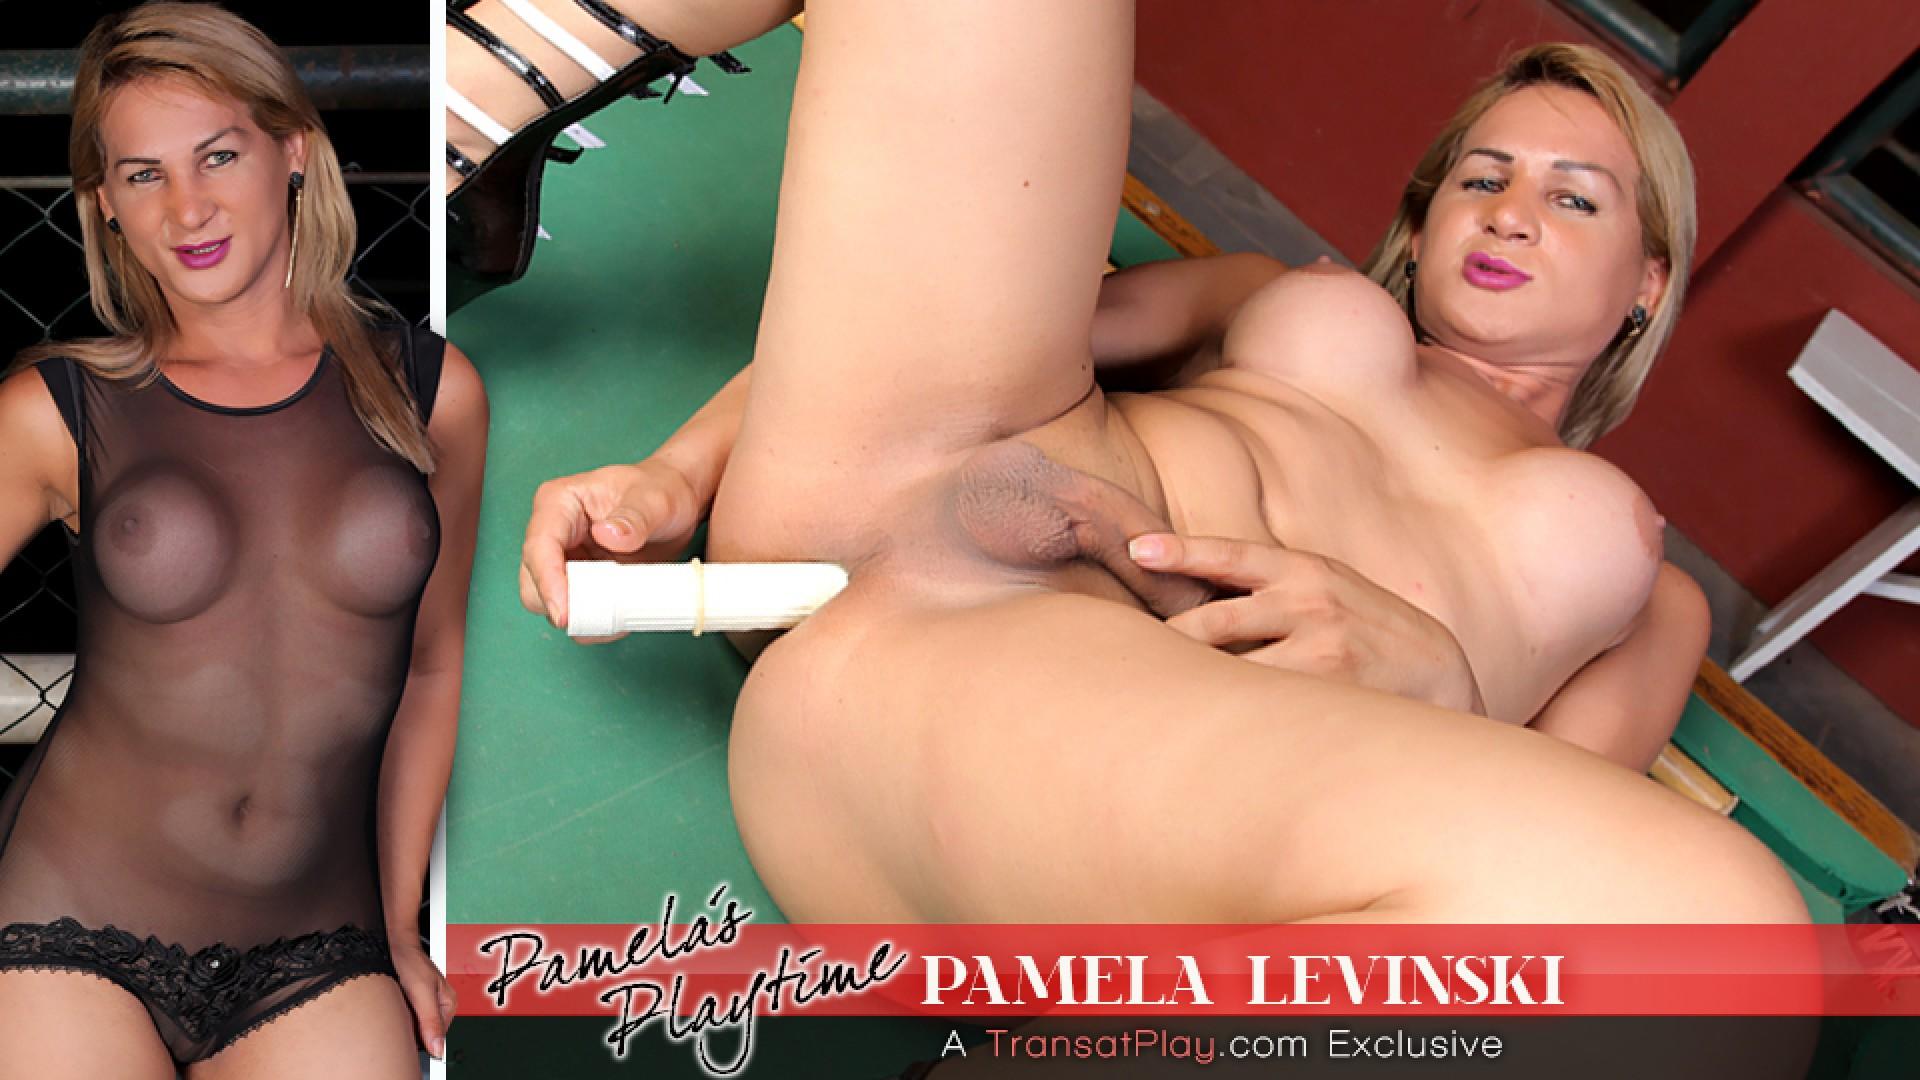 Pamela Levinski in Pamelas Playtime - TransAtPlay Cartoon sex mlp